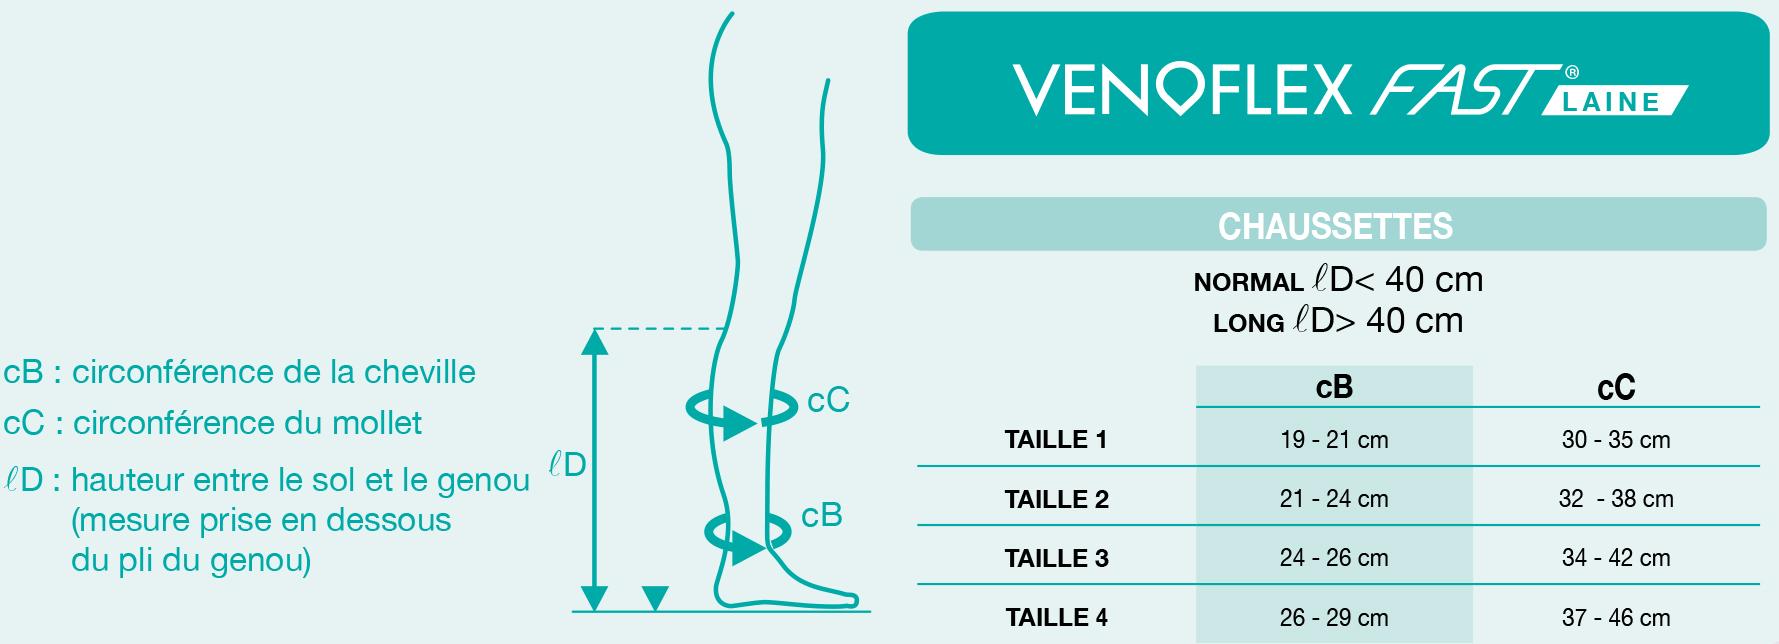 taillage venoflex fast laine